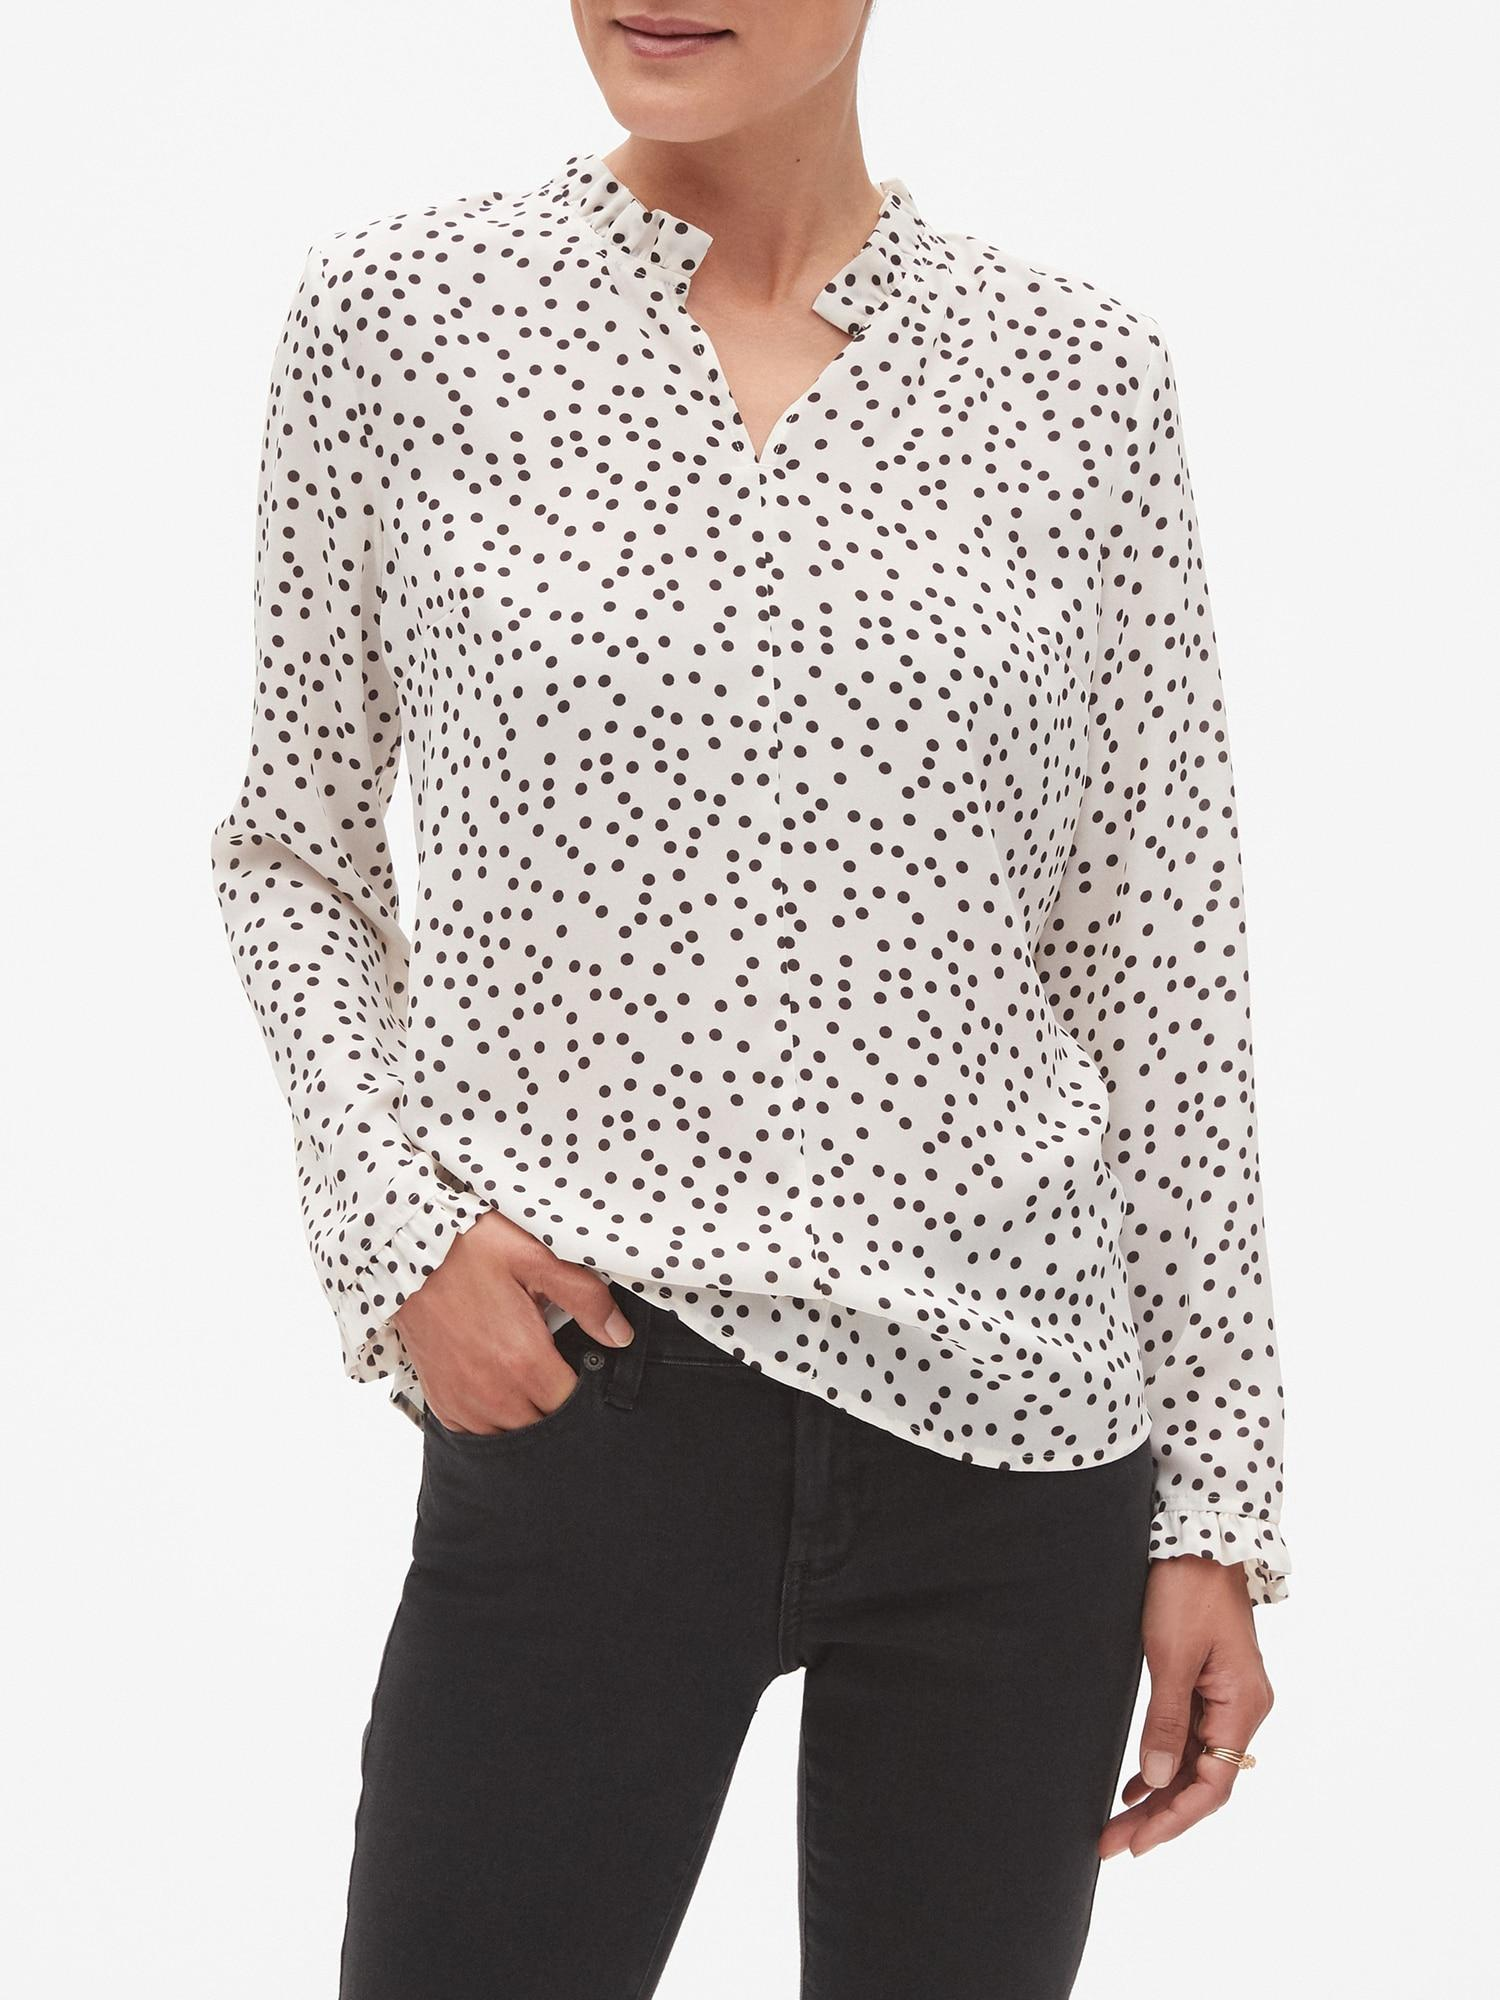 bed0417afce93 Banana Republic Factory. Women s White Print High Collar Ruffle Trim Blouse